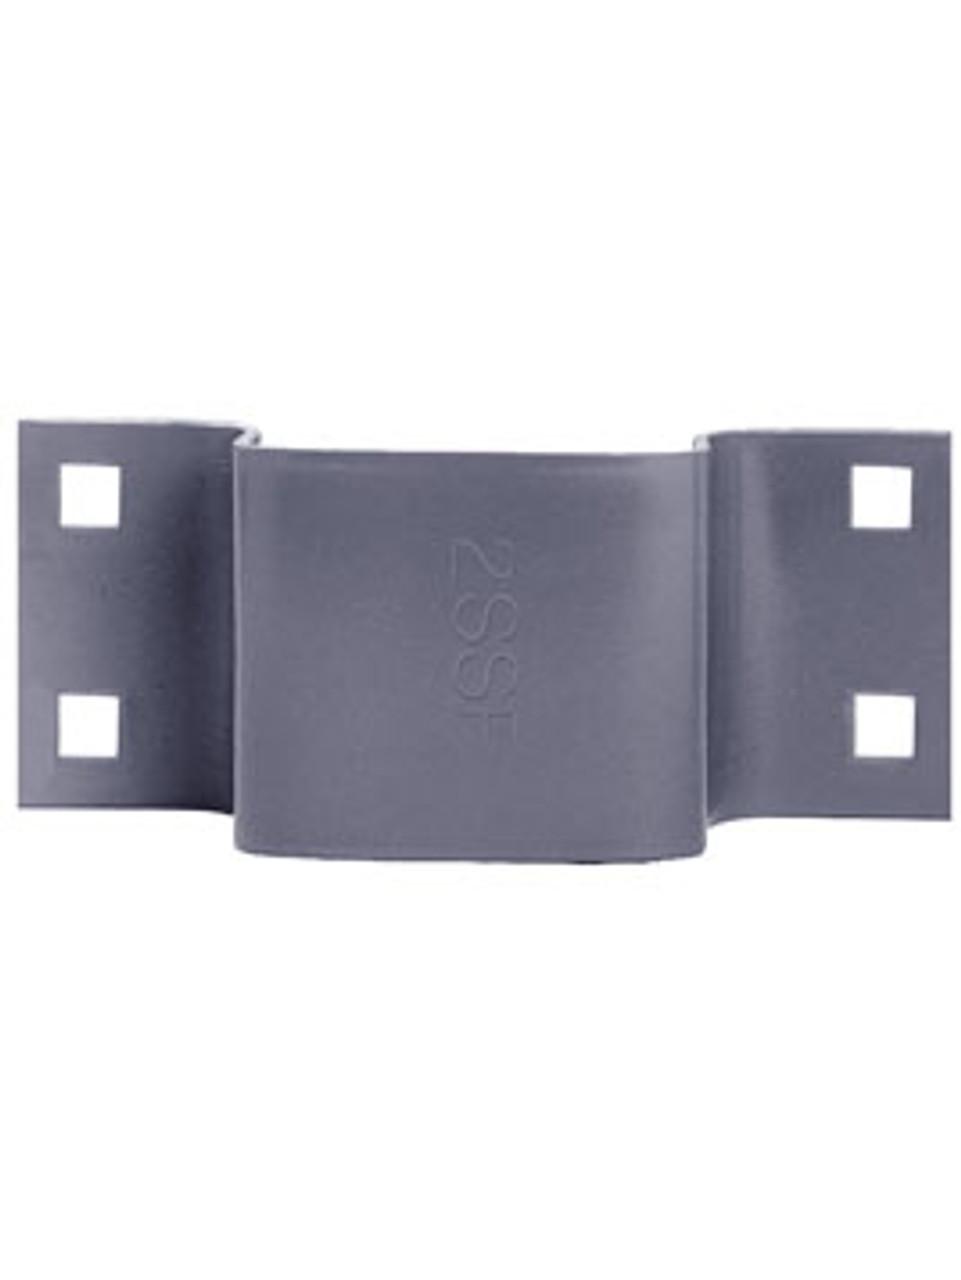 PS1B --- Stake Pocket - Bolt On